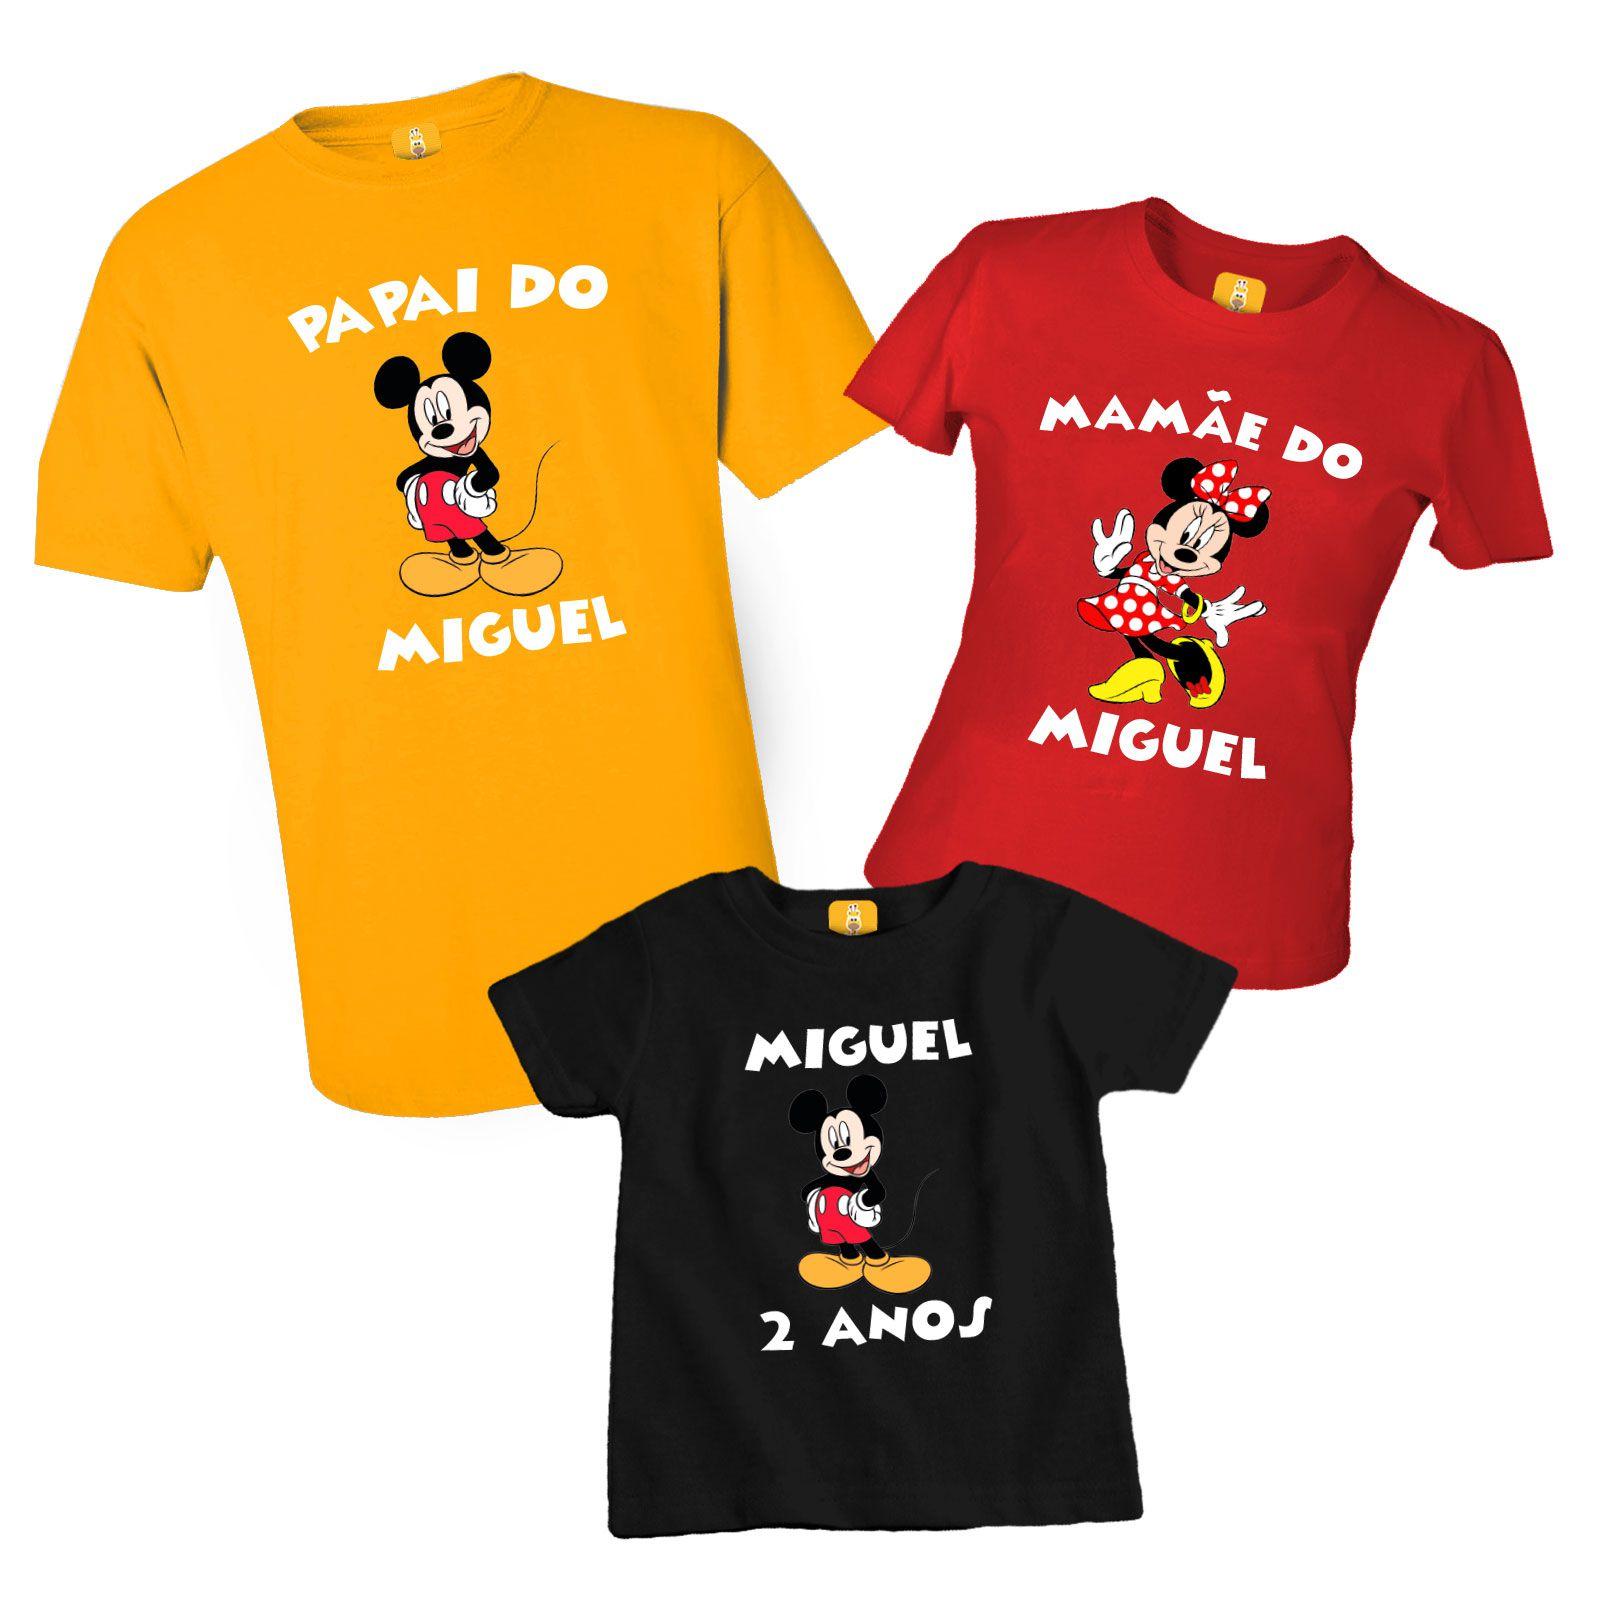 Camiseta para aniversário do Mickey e Minnie